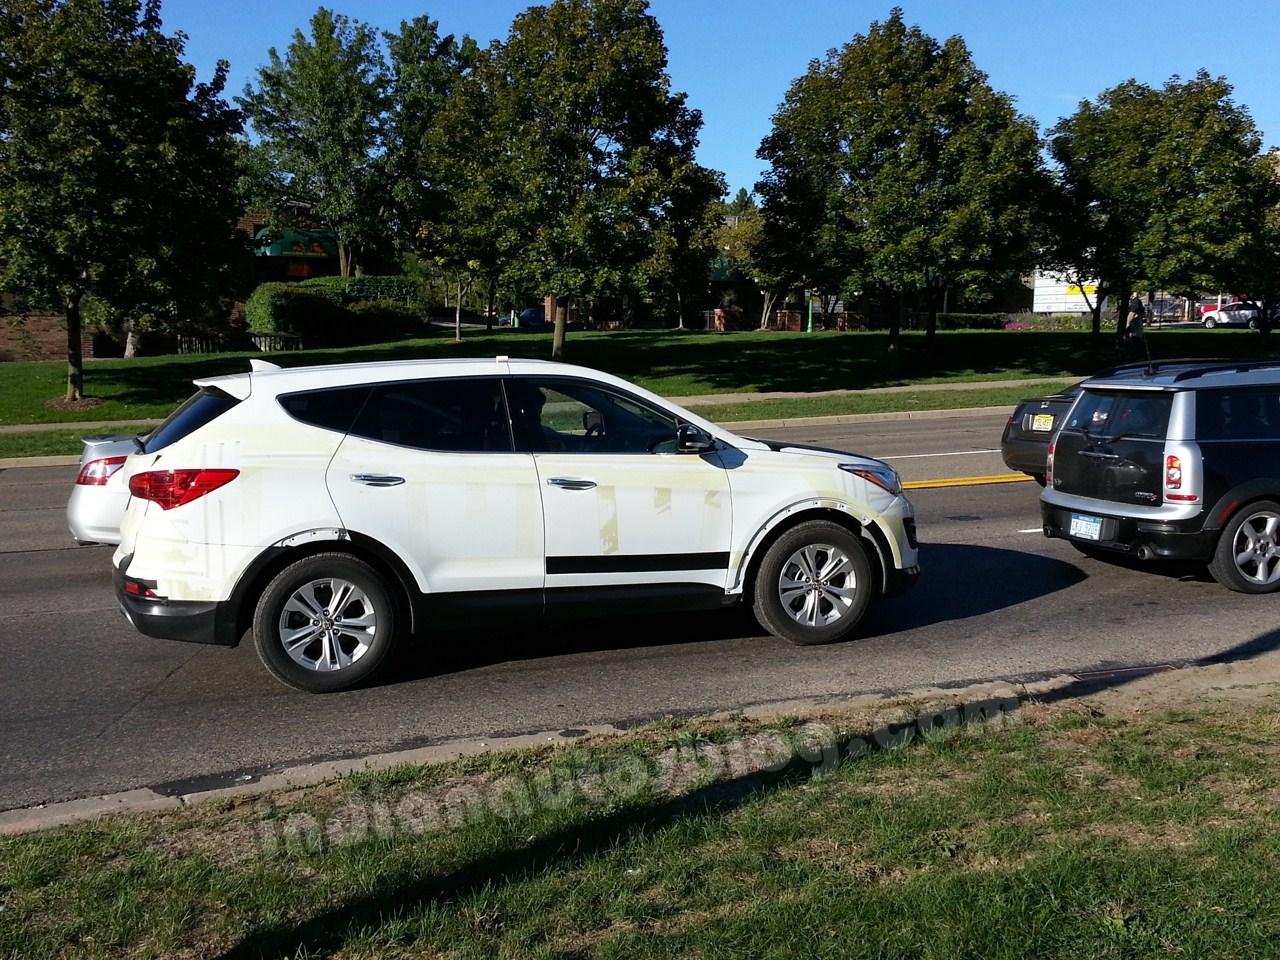 2013 Hyundai Santa Fe test mule spotted in Ann Arbor, Michigan